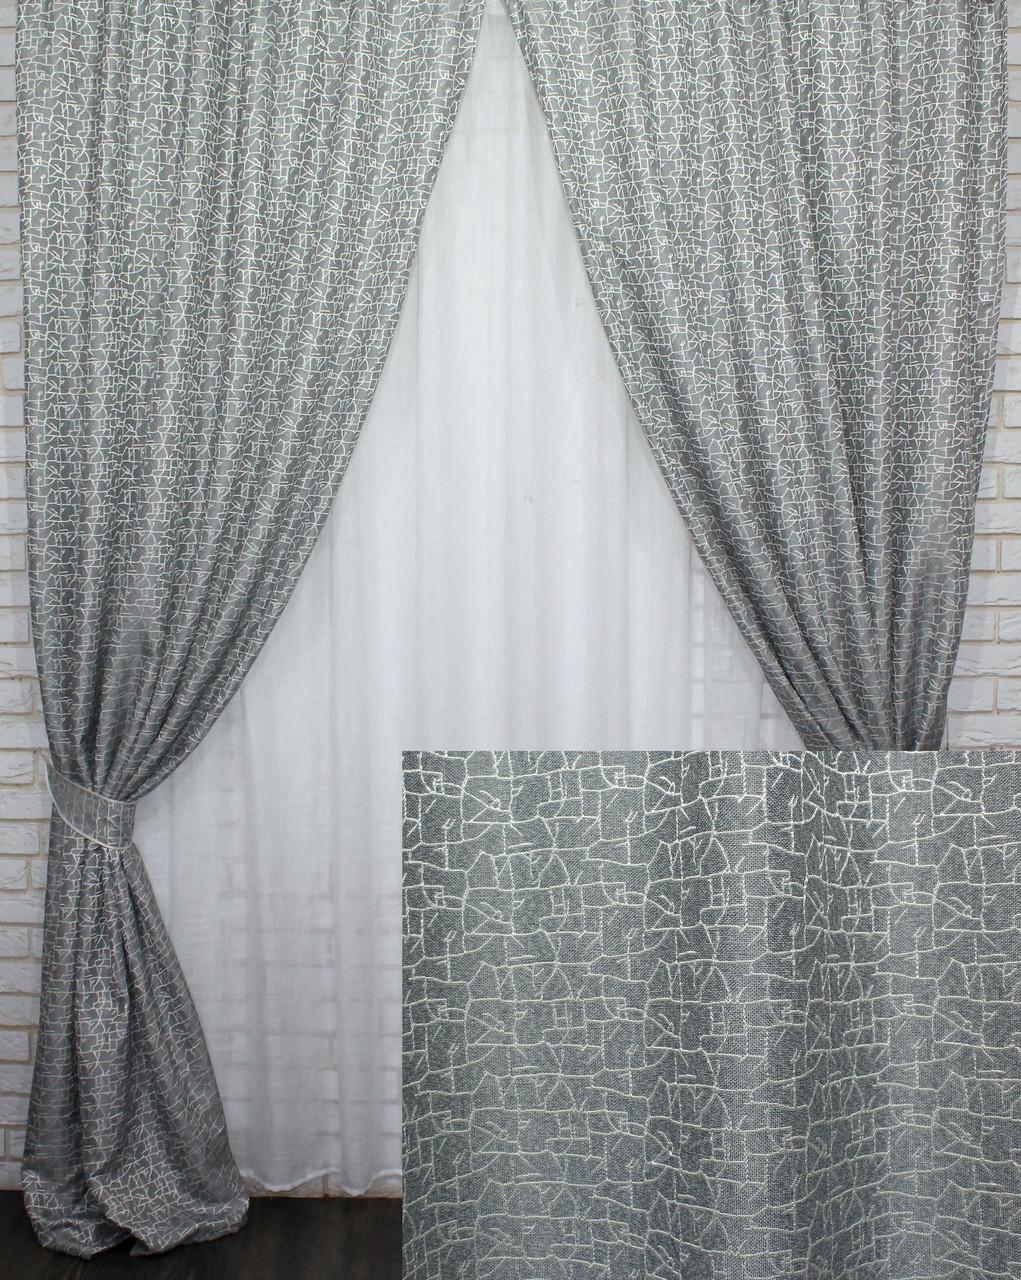 "Шторы (2шт.1,5х2.7м) из плотной ткани лен ""Корона Мария"", Цвет серый. Код 641ш 30-412"